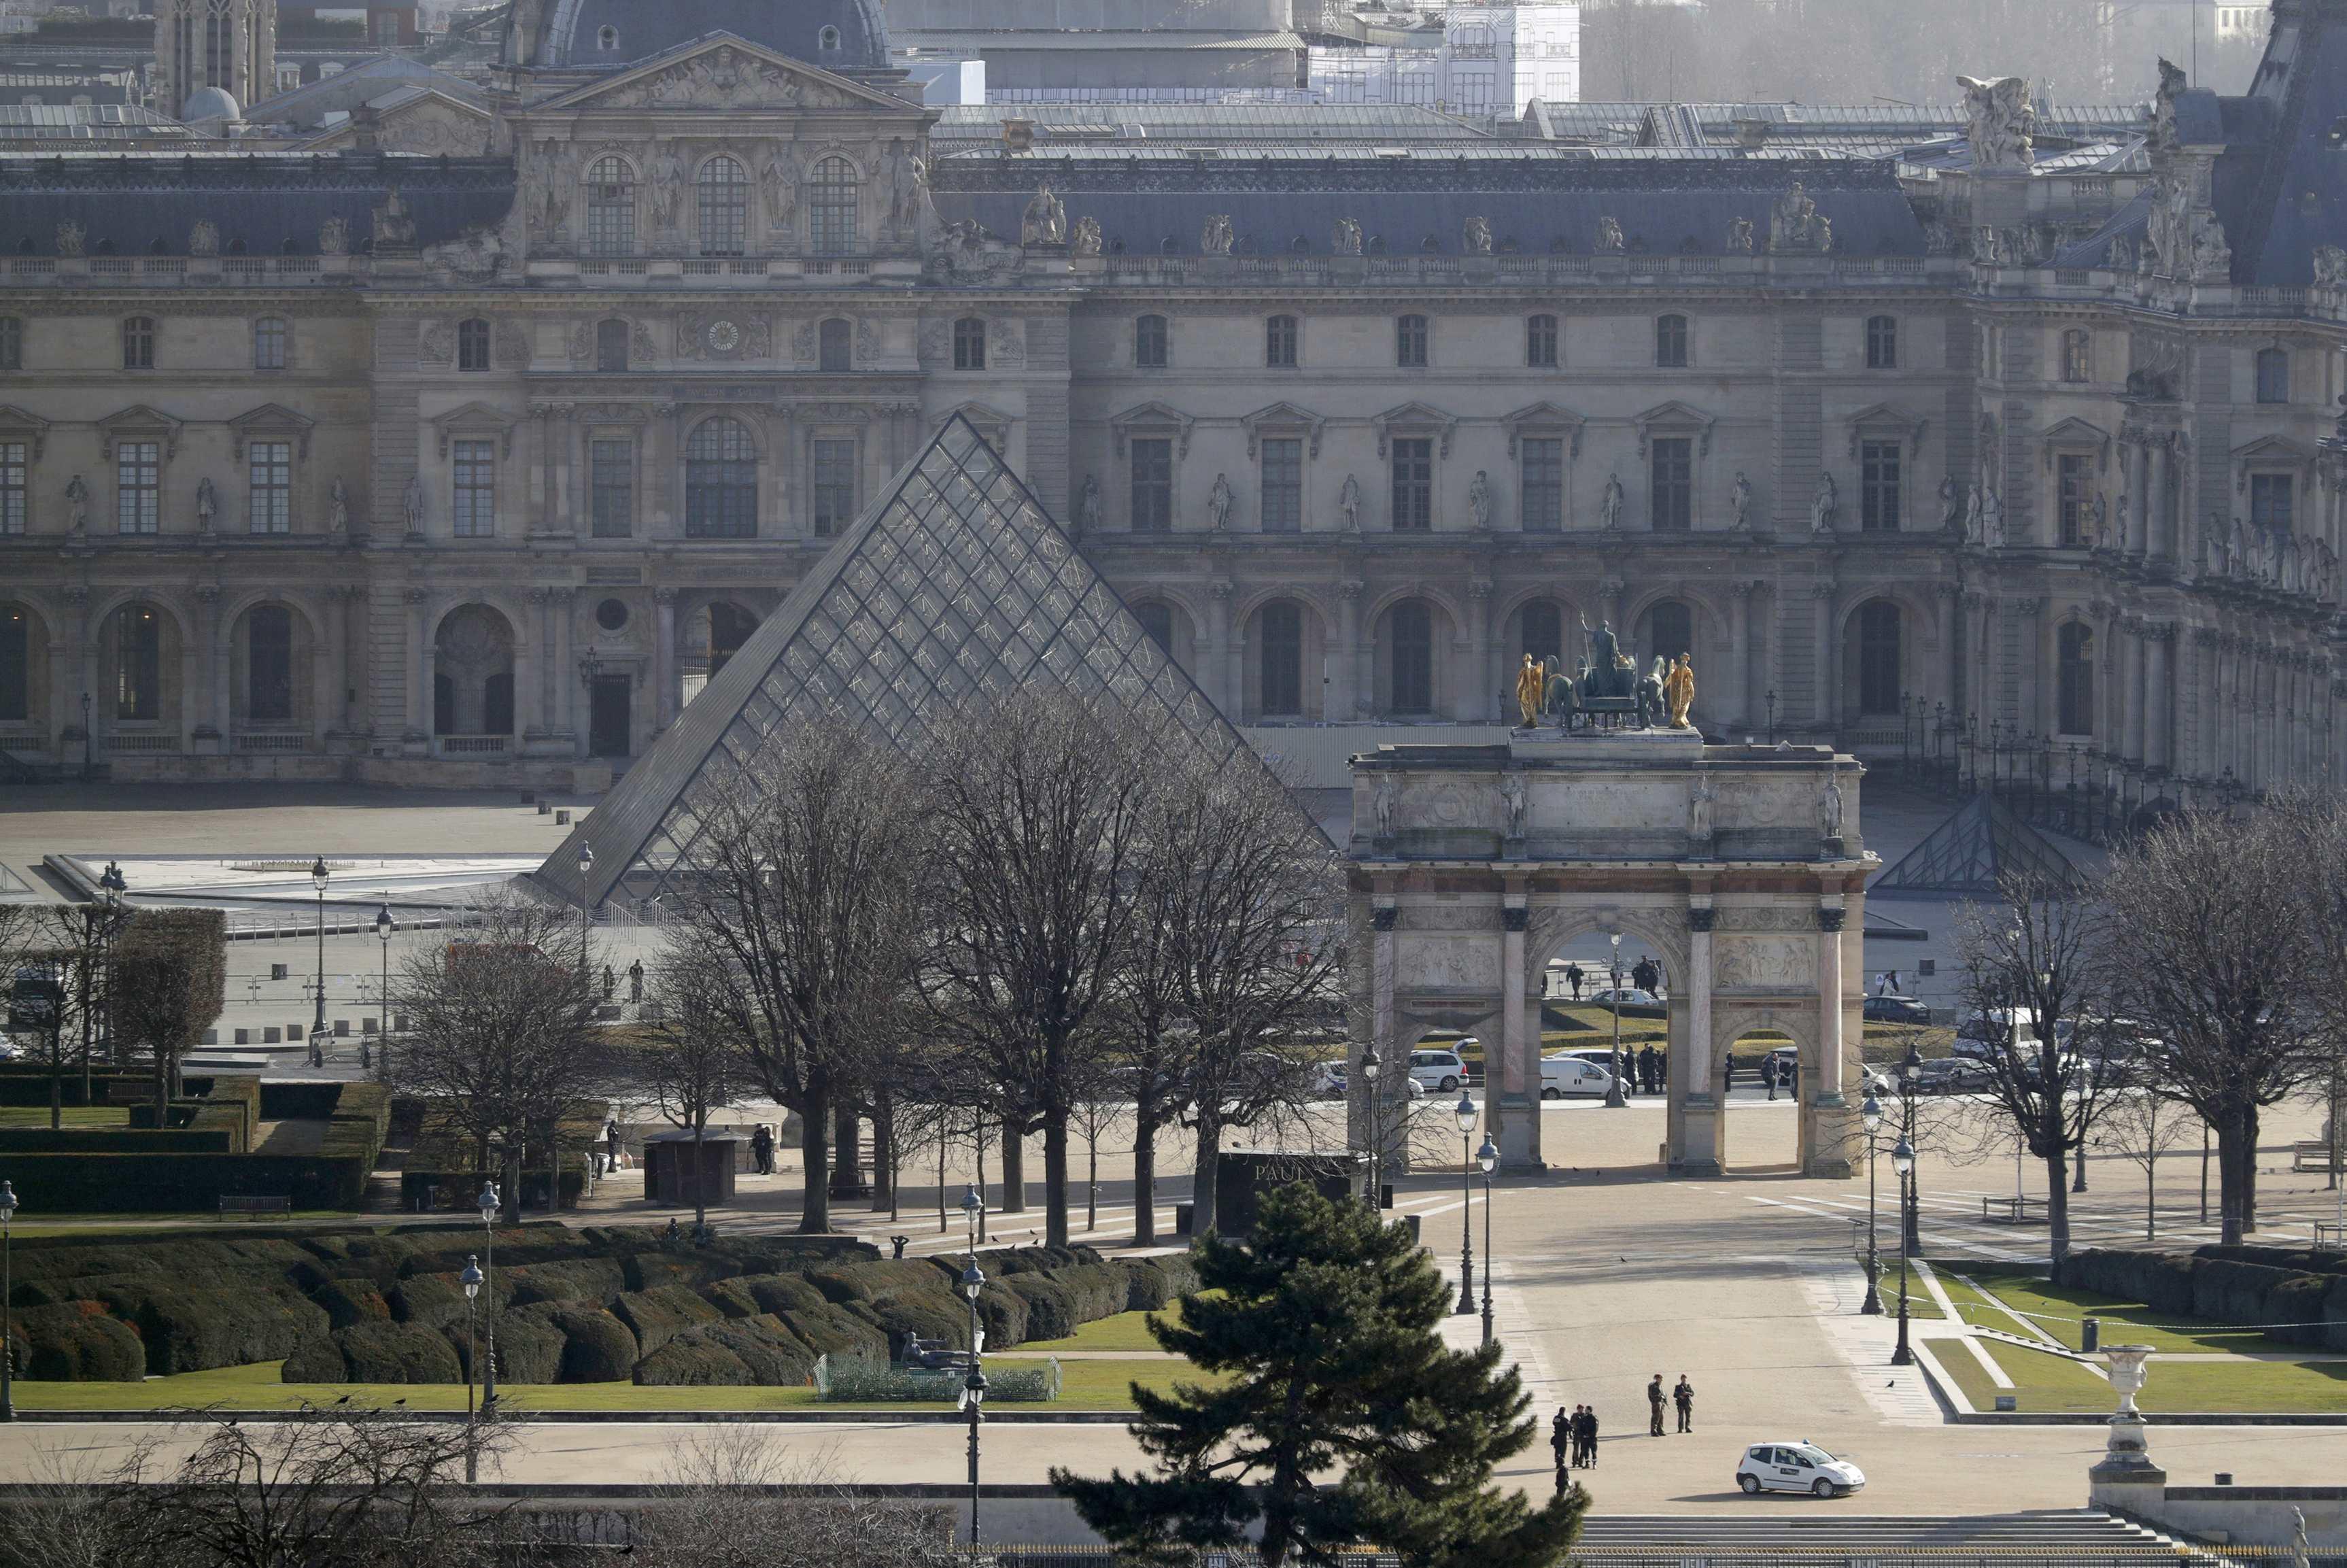 Carrousel du Louvre in Paris, sight of recent terrorist attack attempt